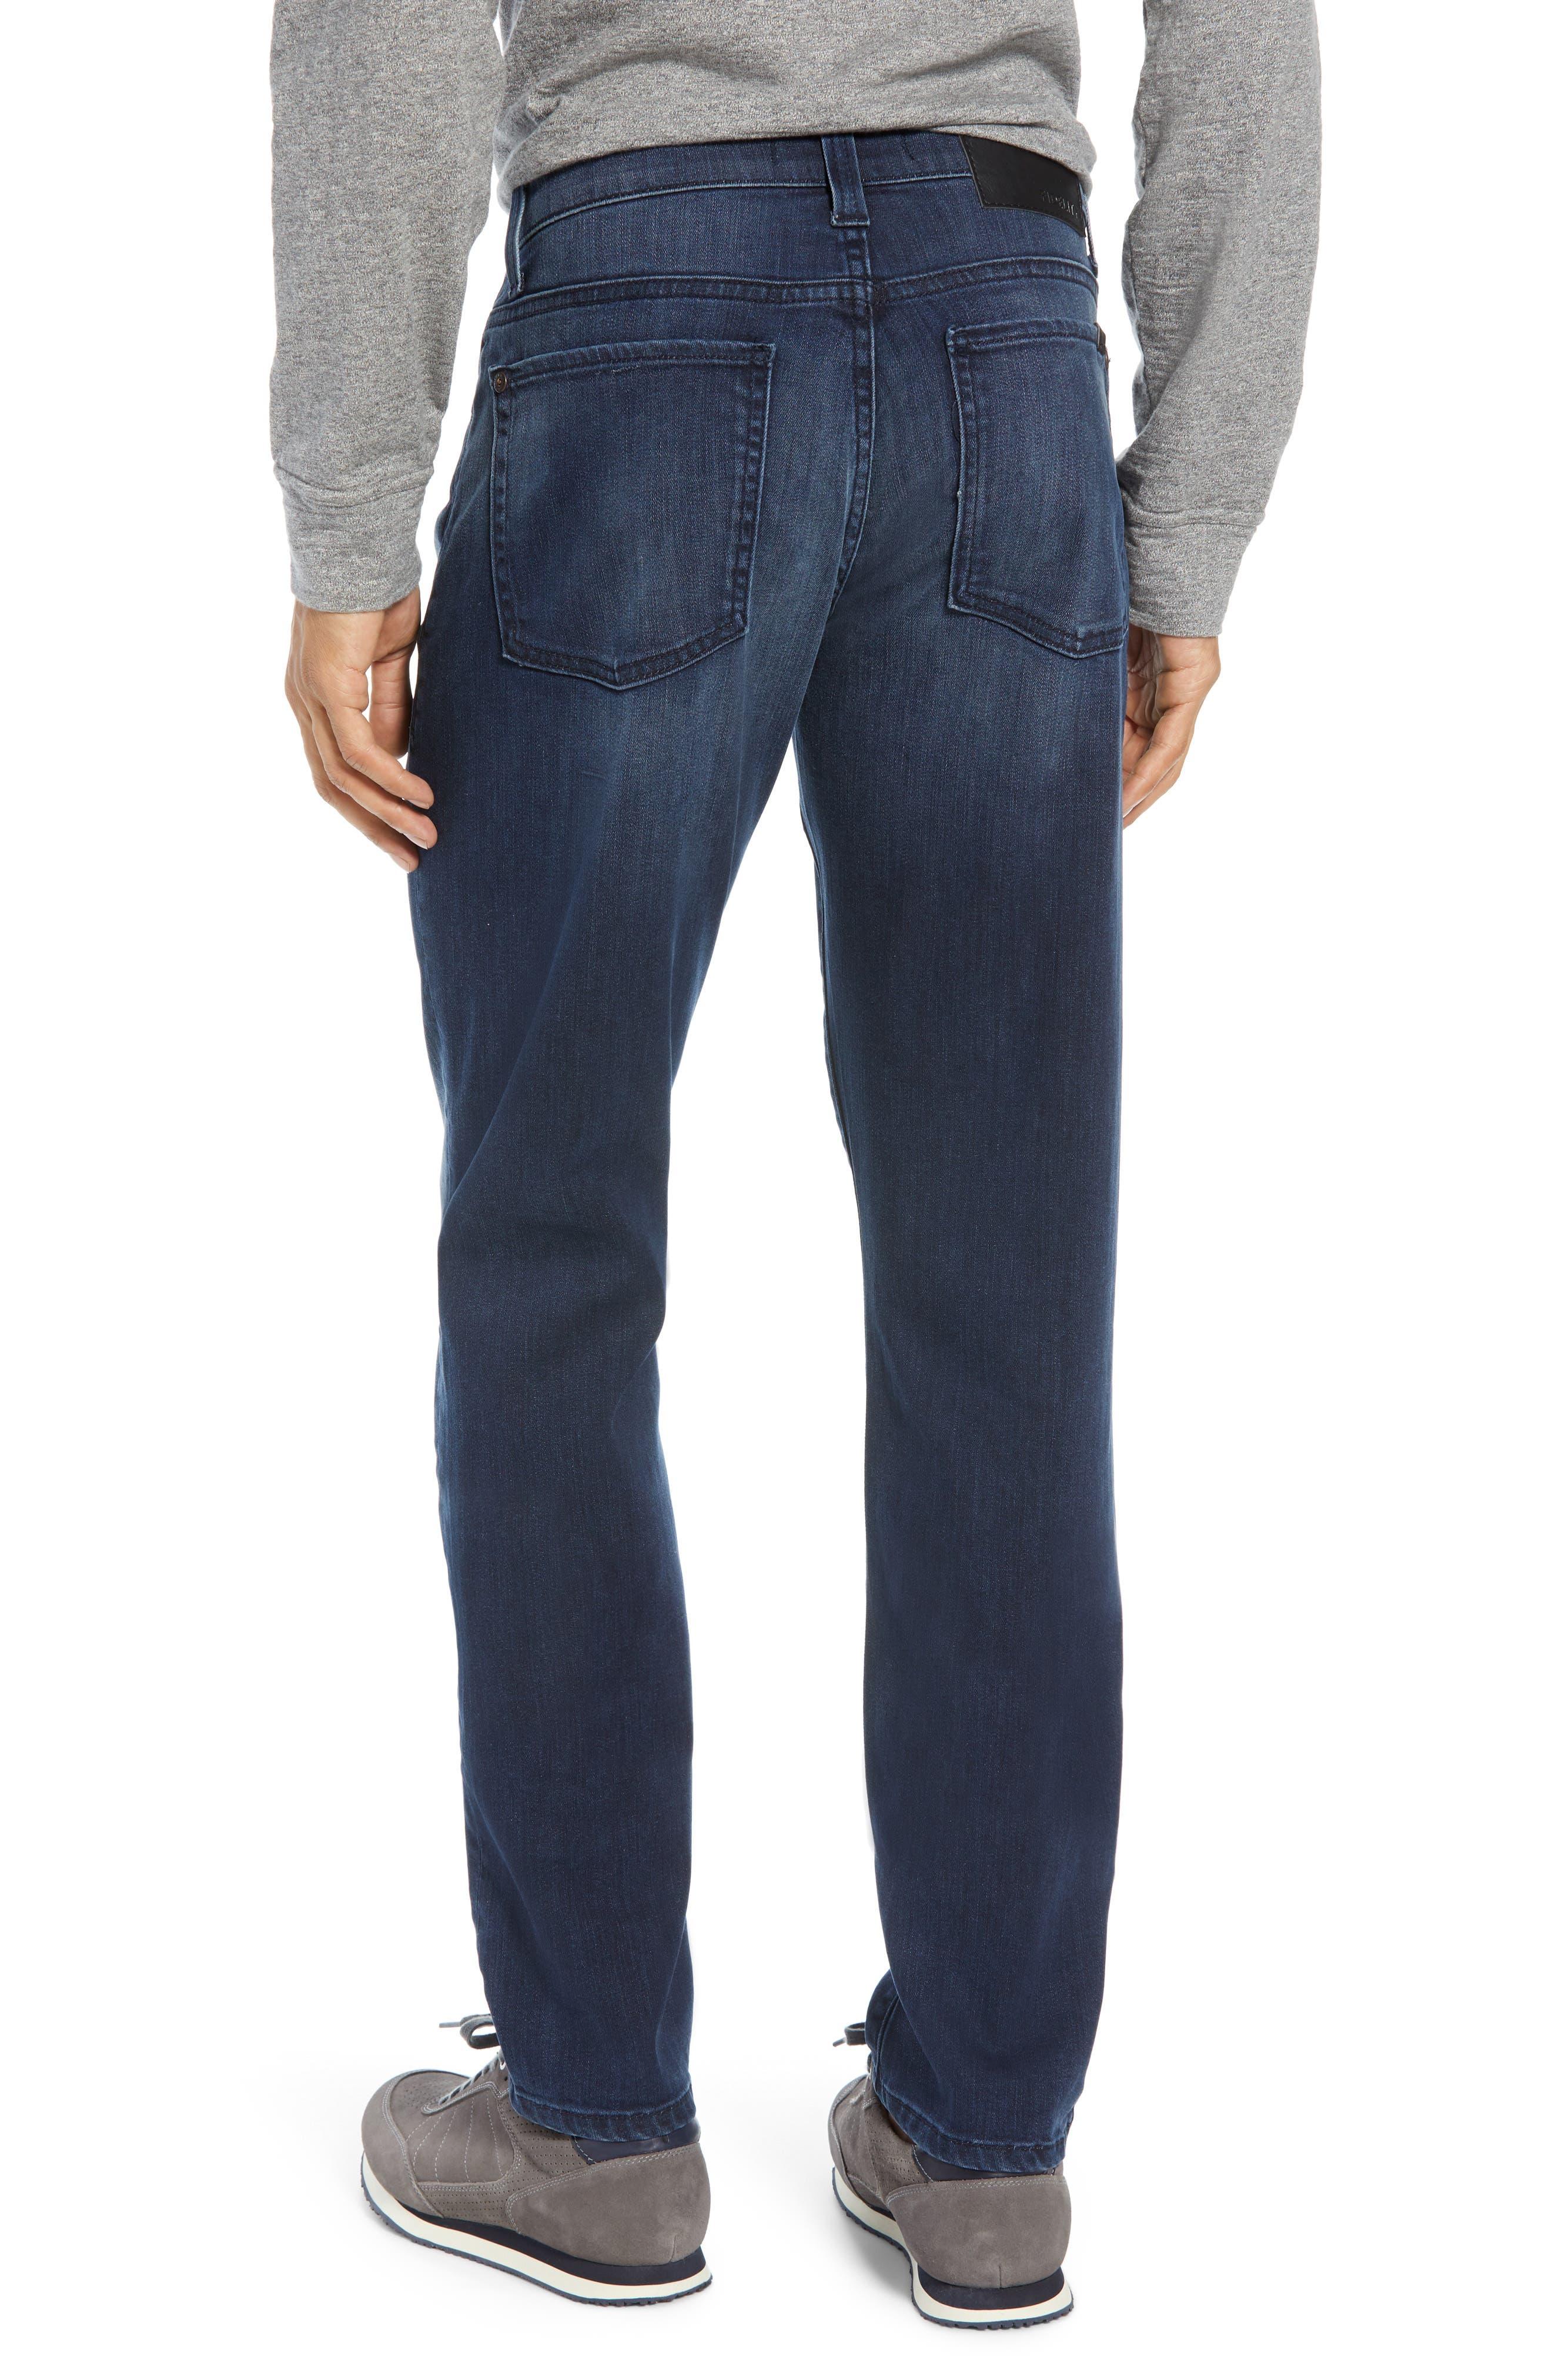 FIDELITY DENIM,                             Torino Slim Fit Jeans,                             Alternate thumbnail 2, color,                             SPECTRE